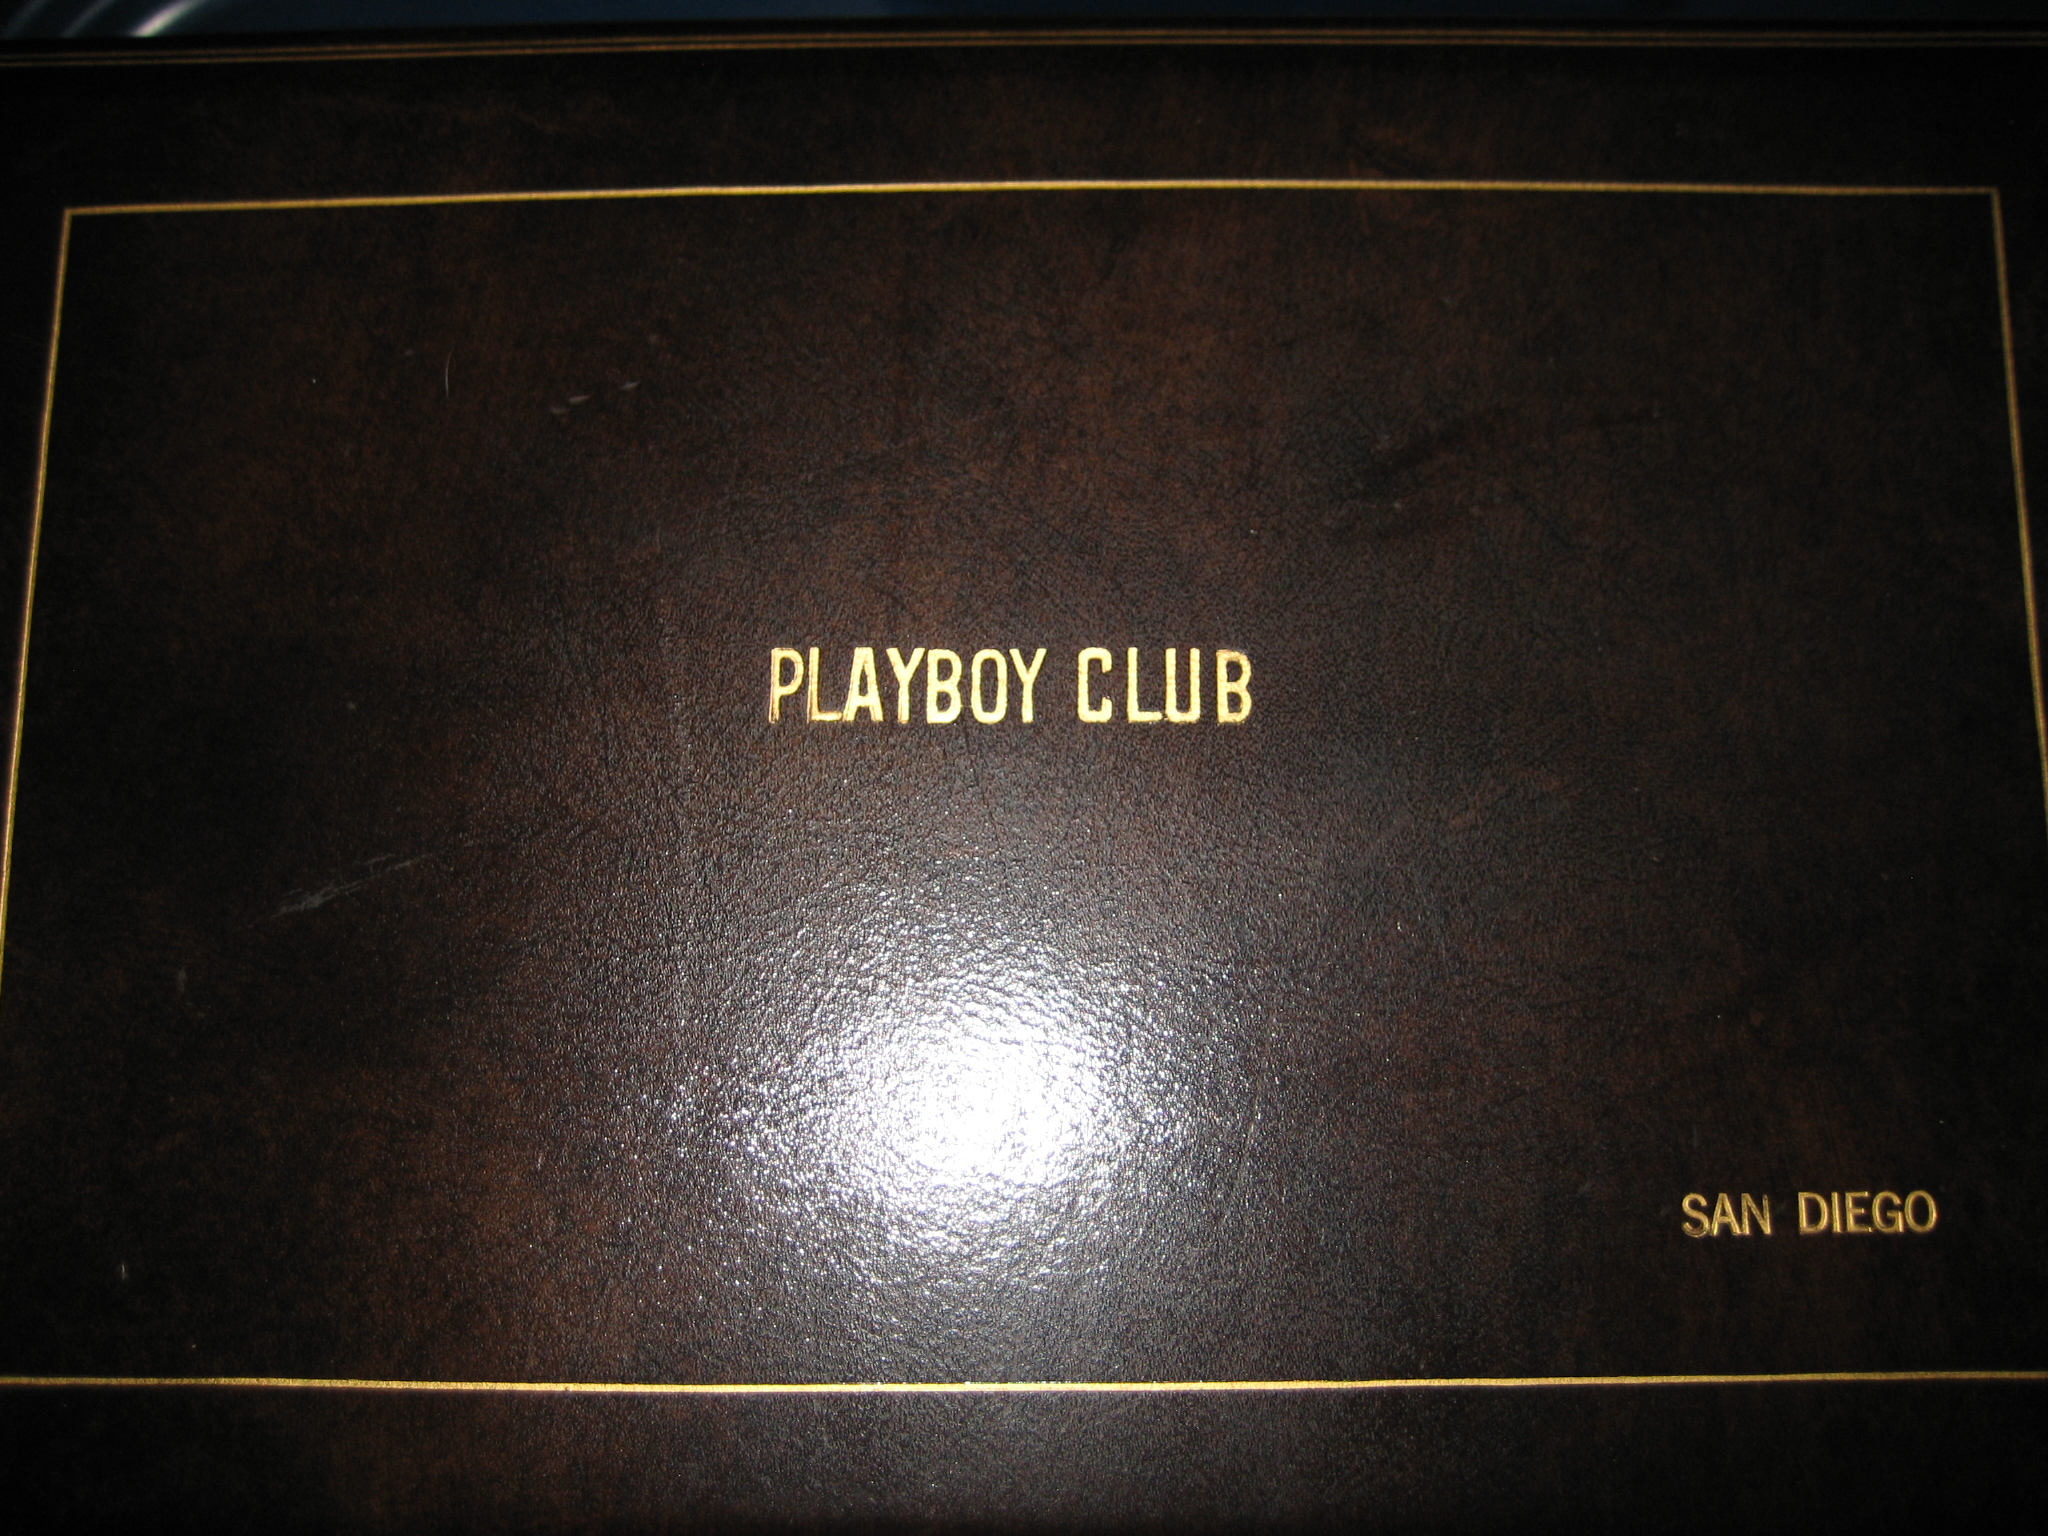 Playboy Club San Diego Humidor